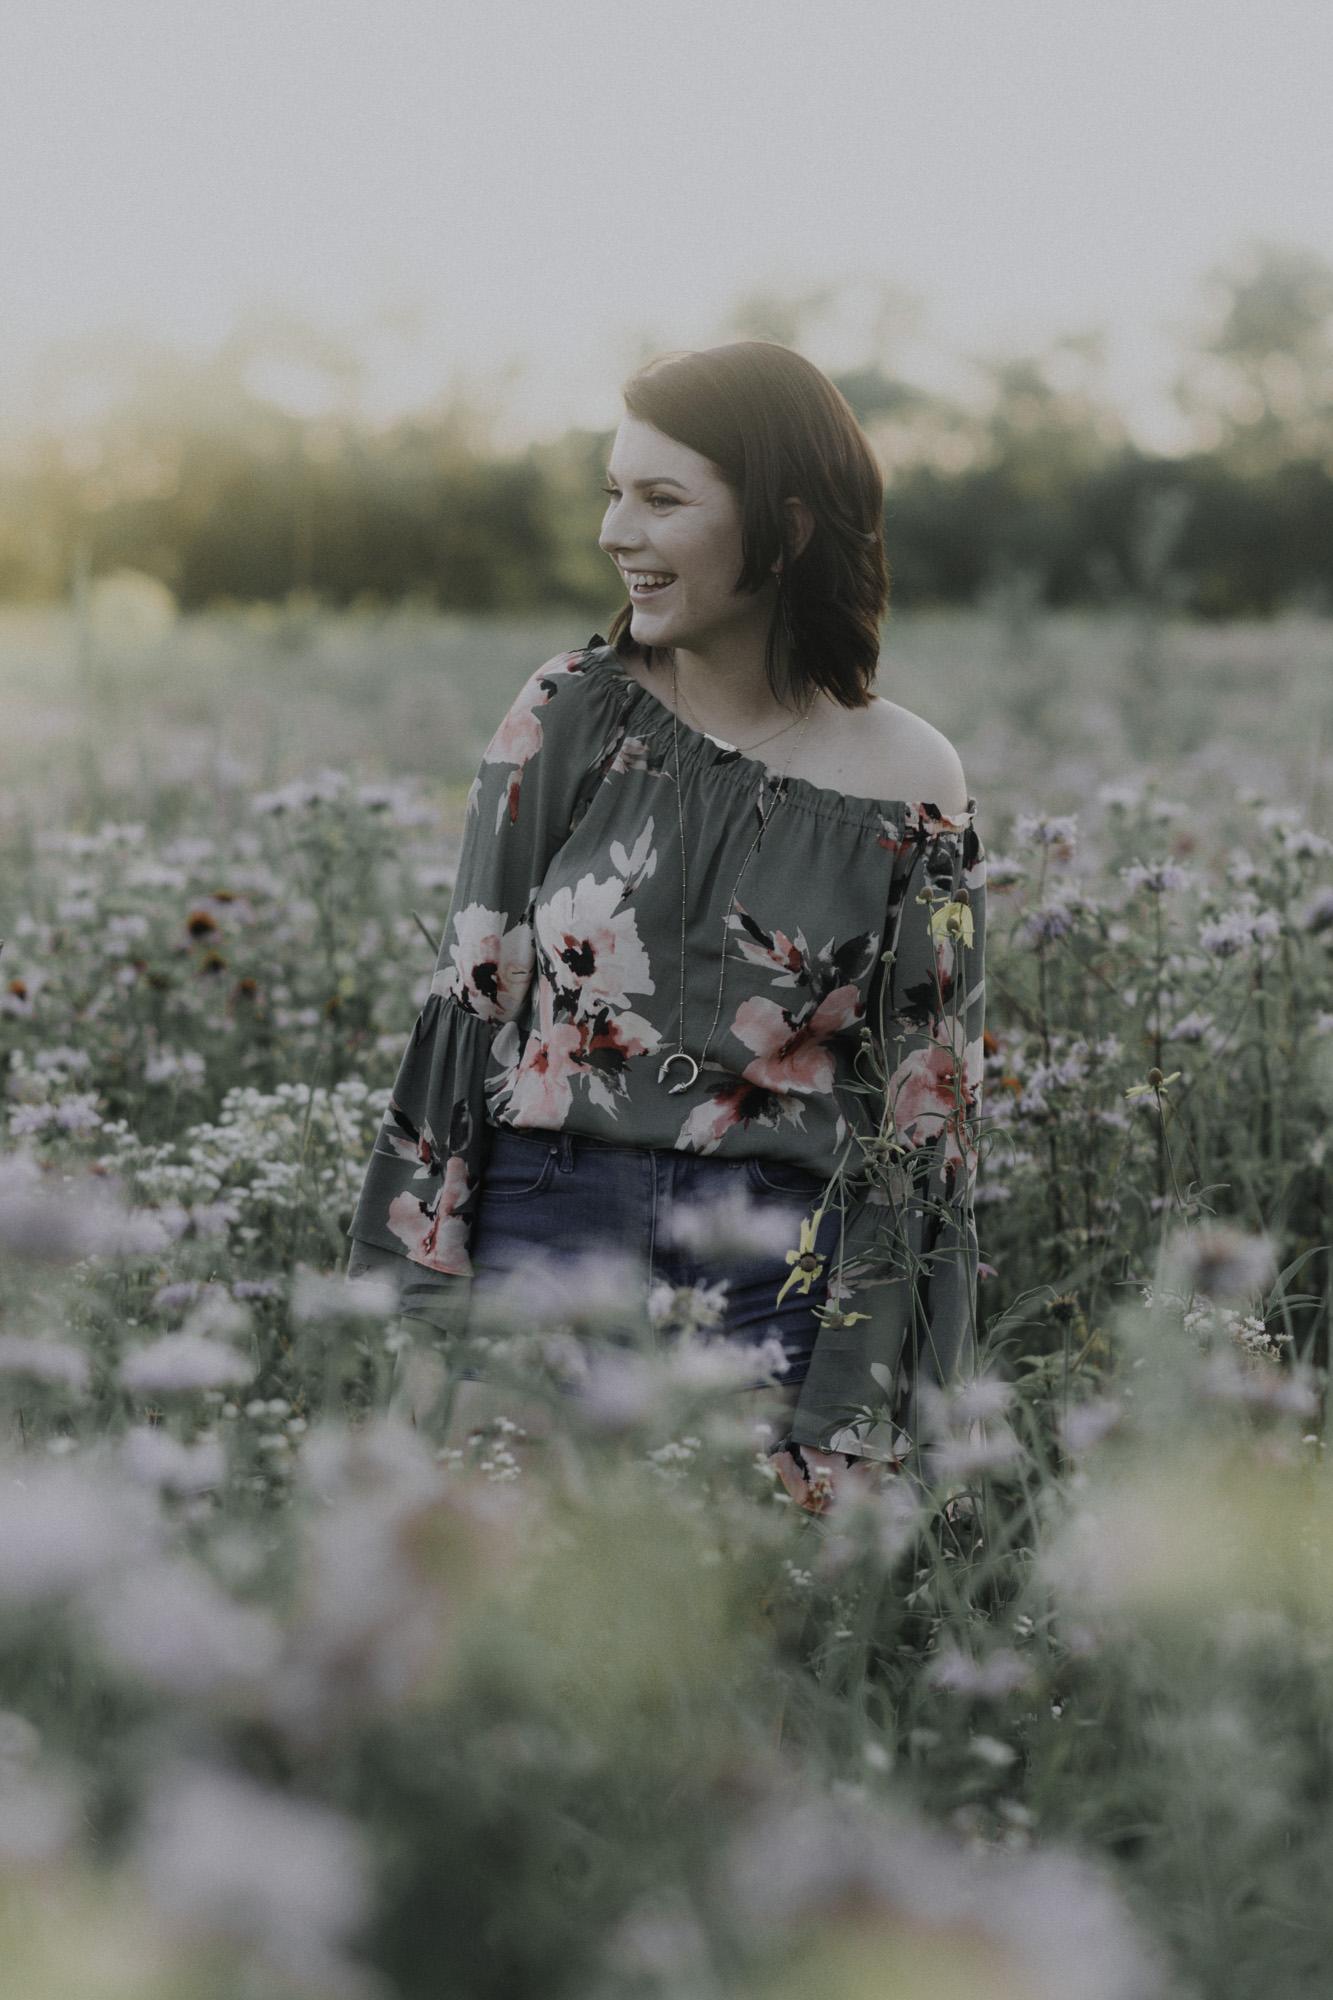 Cate_Ann_Photography_Dayton_Ohio_Wedding_Elopement_And_Engagement_Photographeruntitled-34.jpg